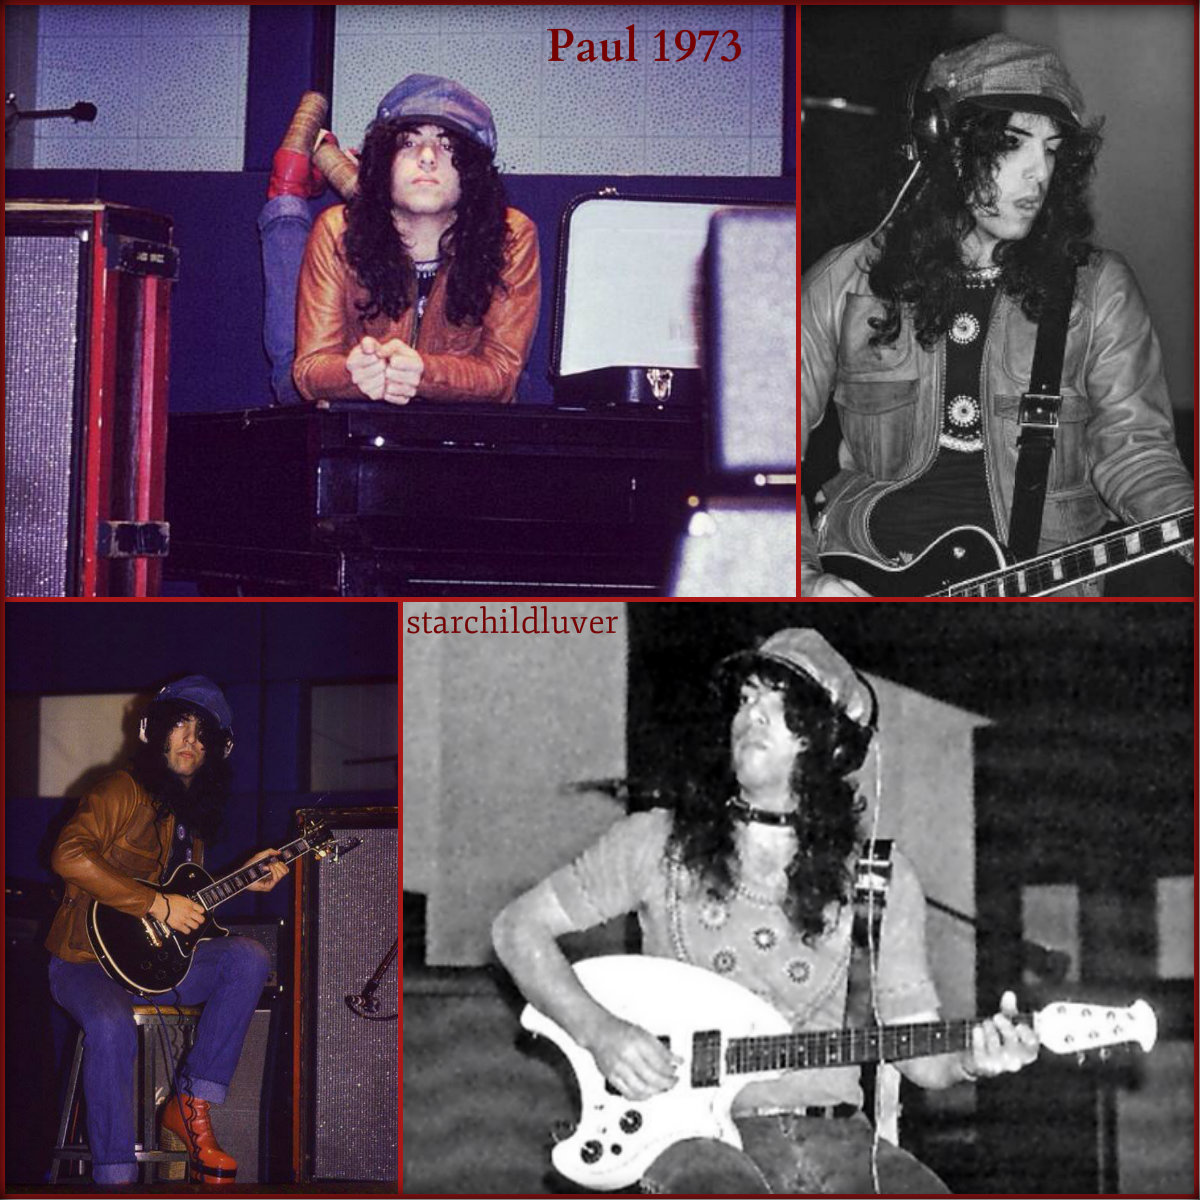 Paul-Stanley-1973-paul-stanley-37198742-1200-1200 jpgPaul Stanley 1973